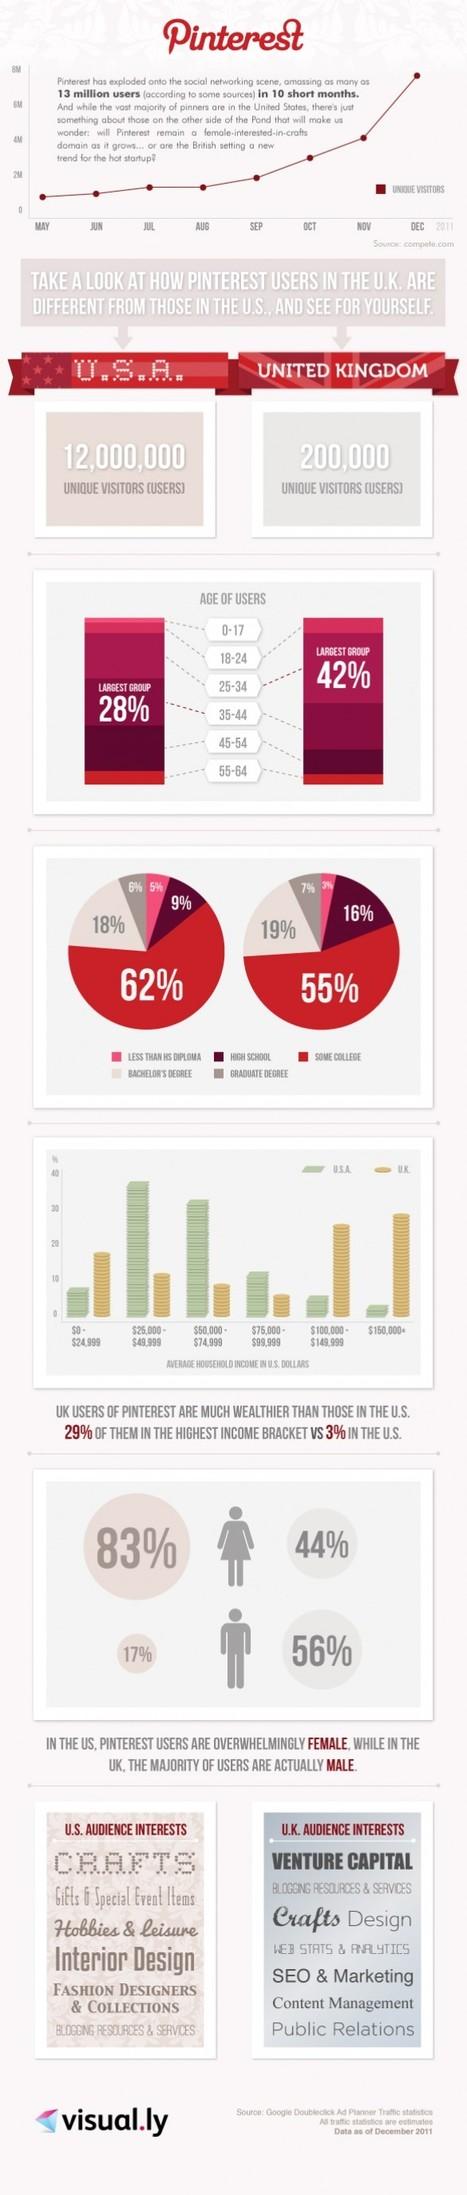 Pinterest Statistics - [Infographic] - On Secret Hunt | Social Media Epic | Scoop.it